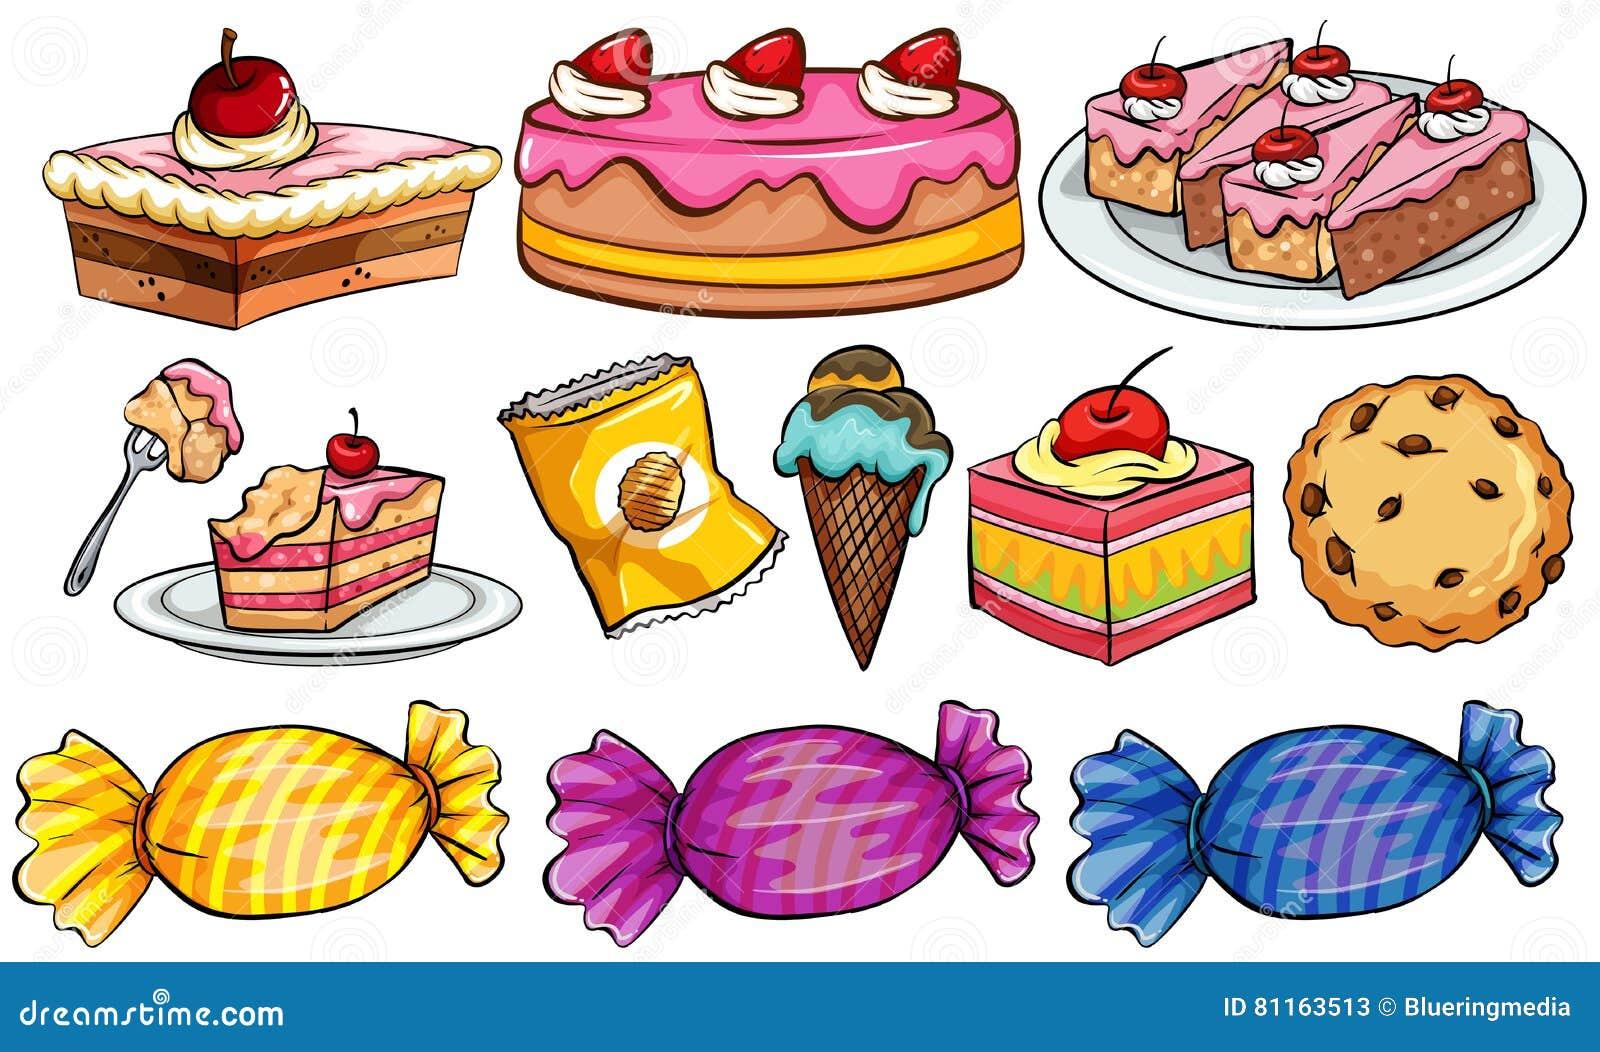 Different Types Of Desserts Cartoon Vector